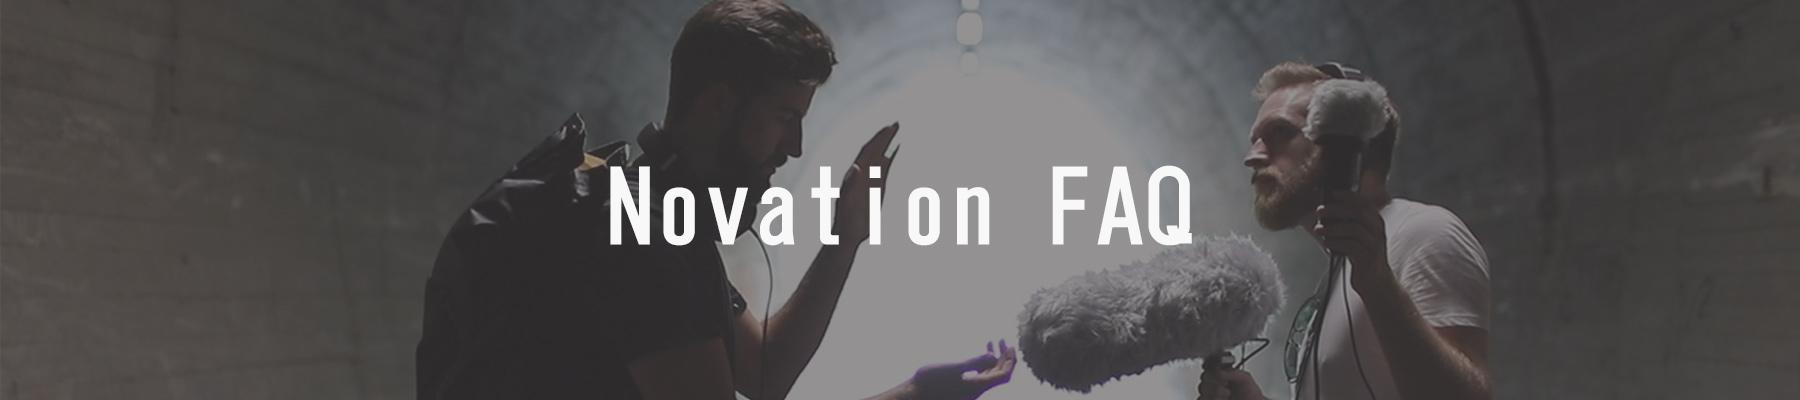 Novation FAQ